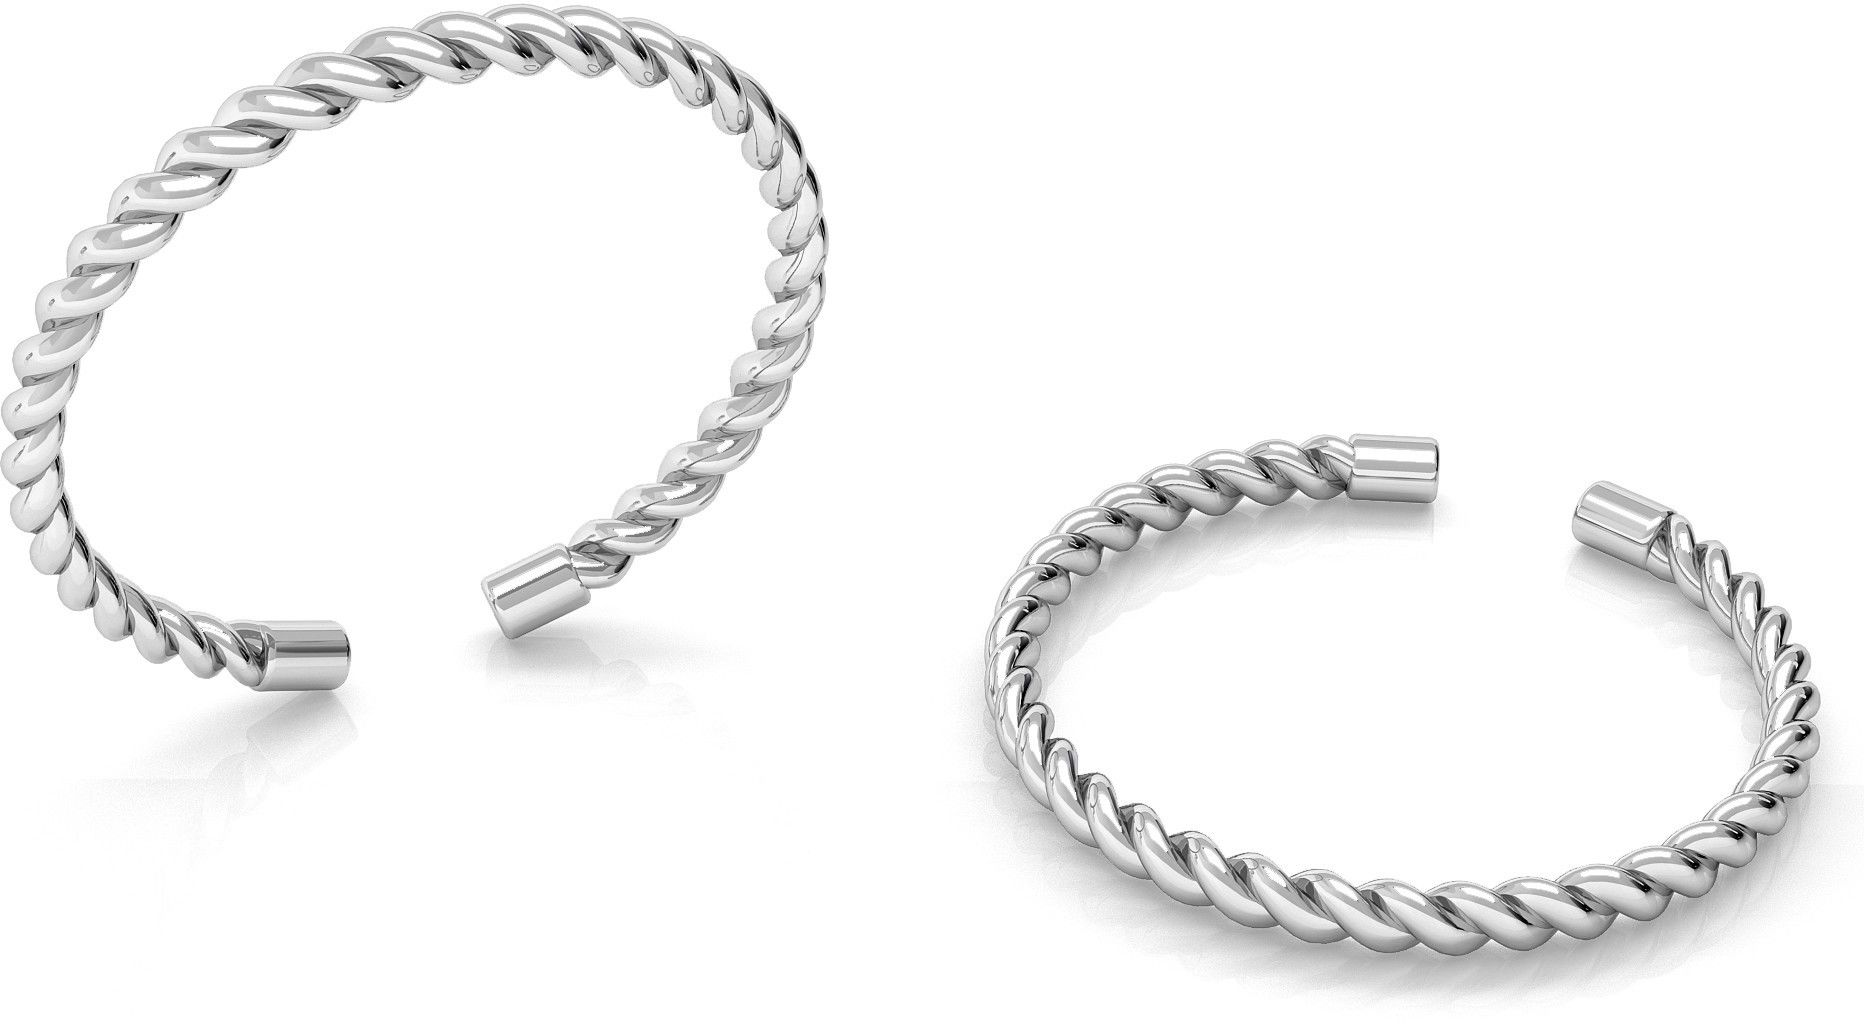 Srebrny pierścionek lina, sznurek, srebro 925 : Srebro - kolor pokrycia - Pokrycie platyną